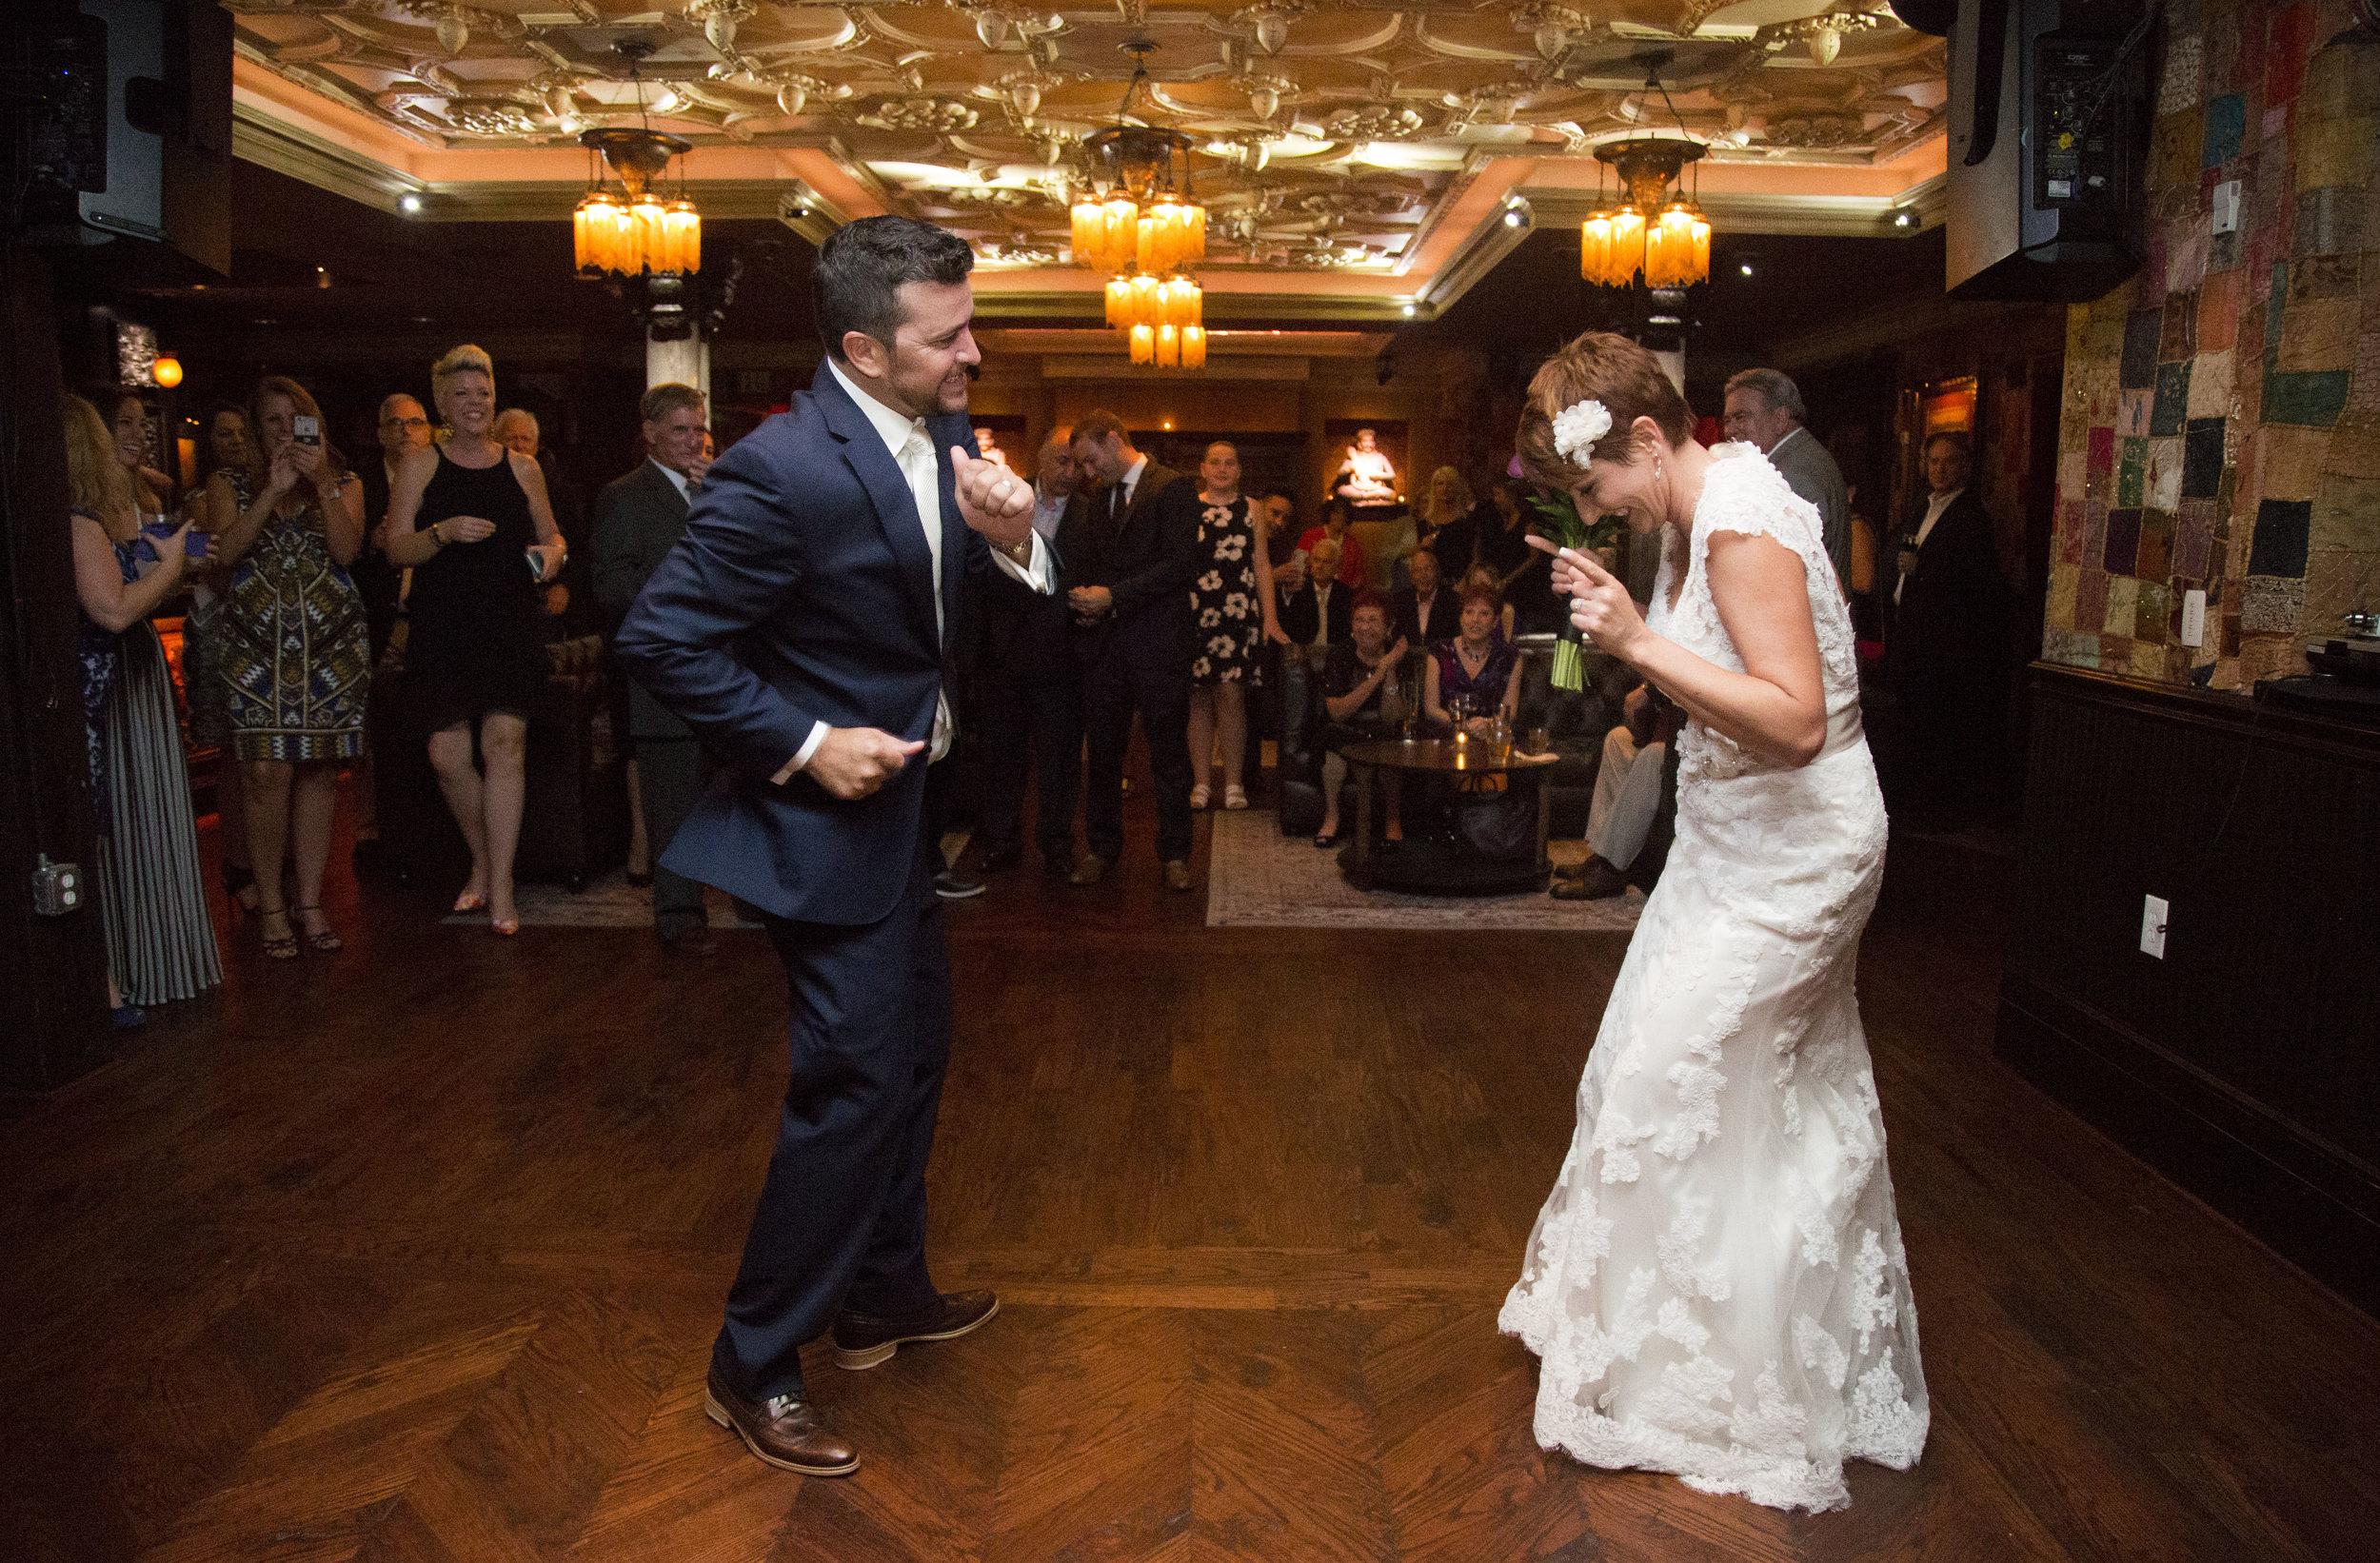 ATGI_Kat and Gabe Wedding 2016_2S8A5676.jpg